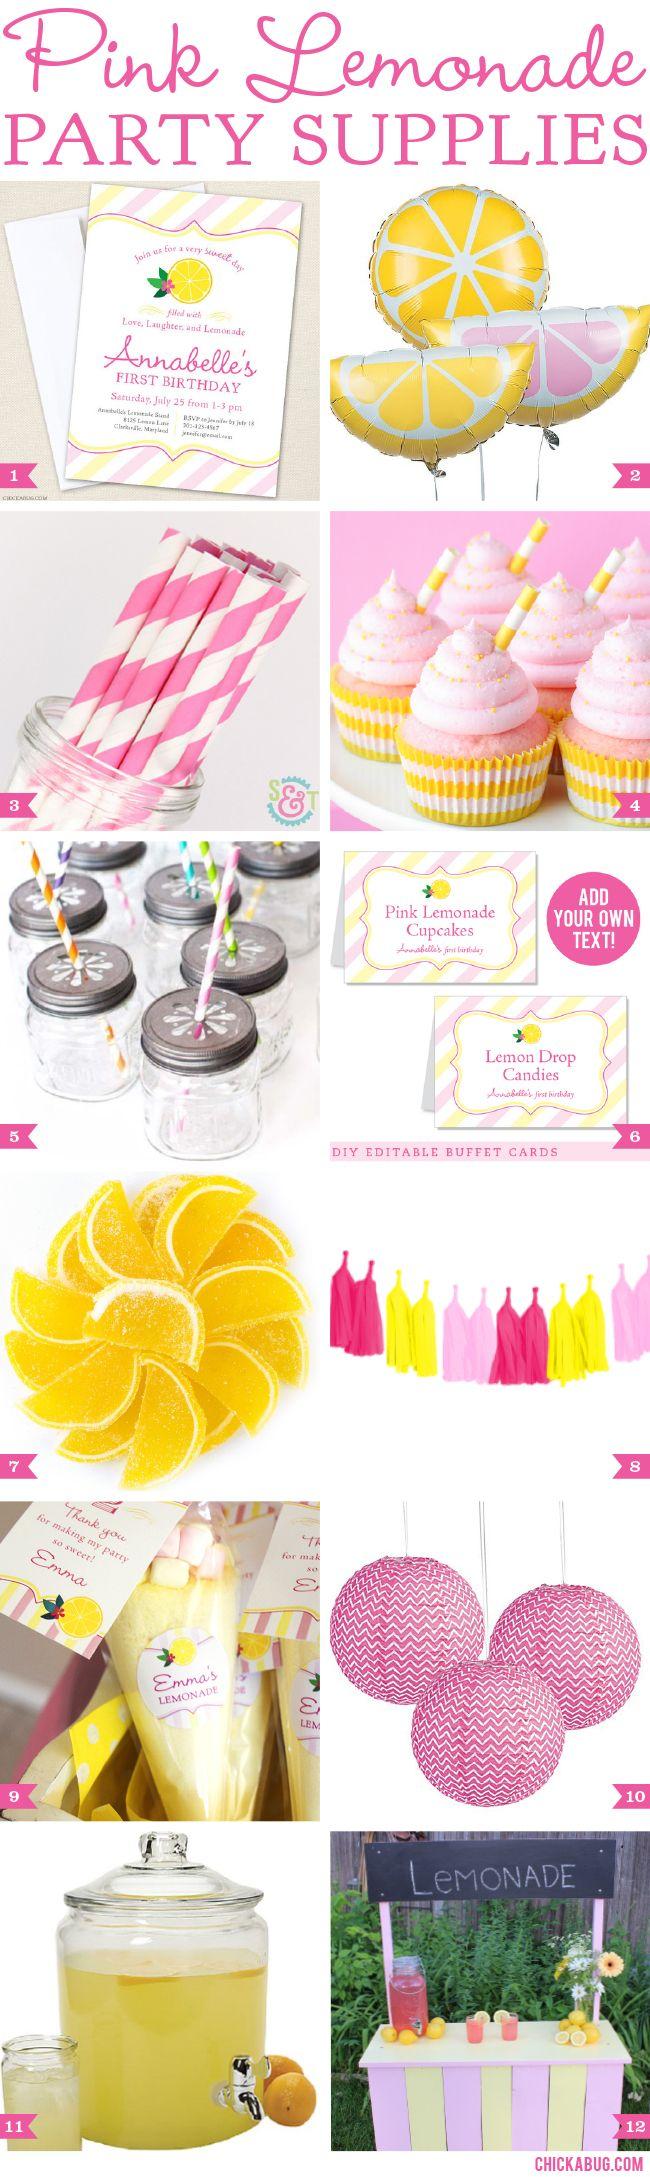 Pink Lemonade Party Supplies